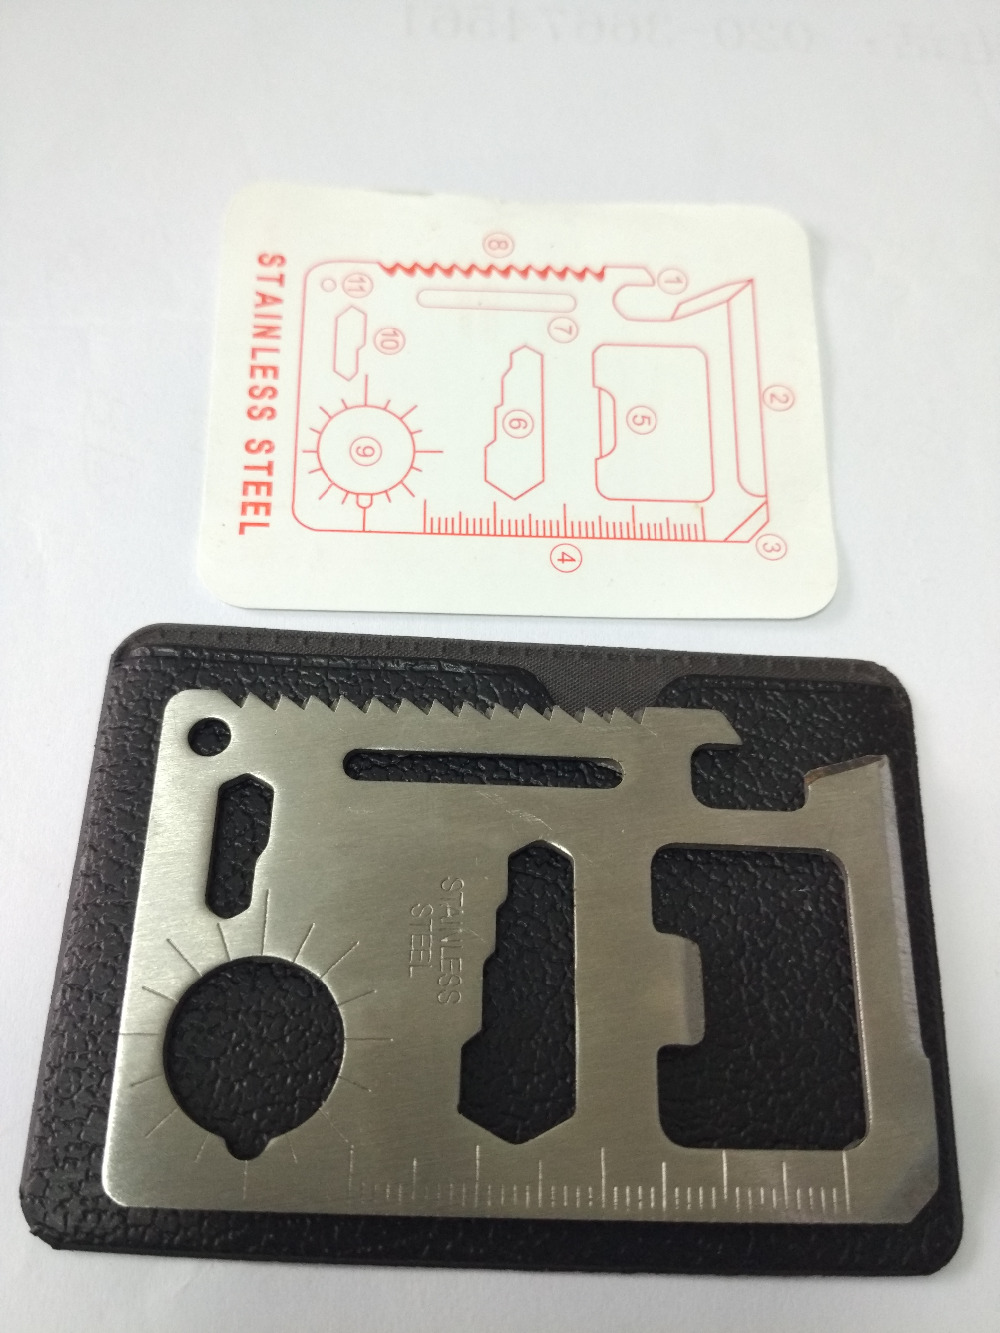 No.1 X2 X-Men tools metal repair for 100%new original phone parts replacement Free ship+Tracking